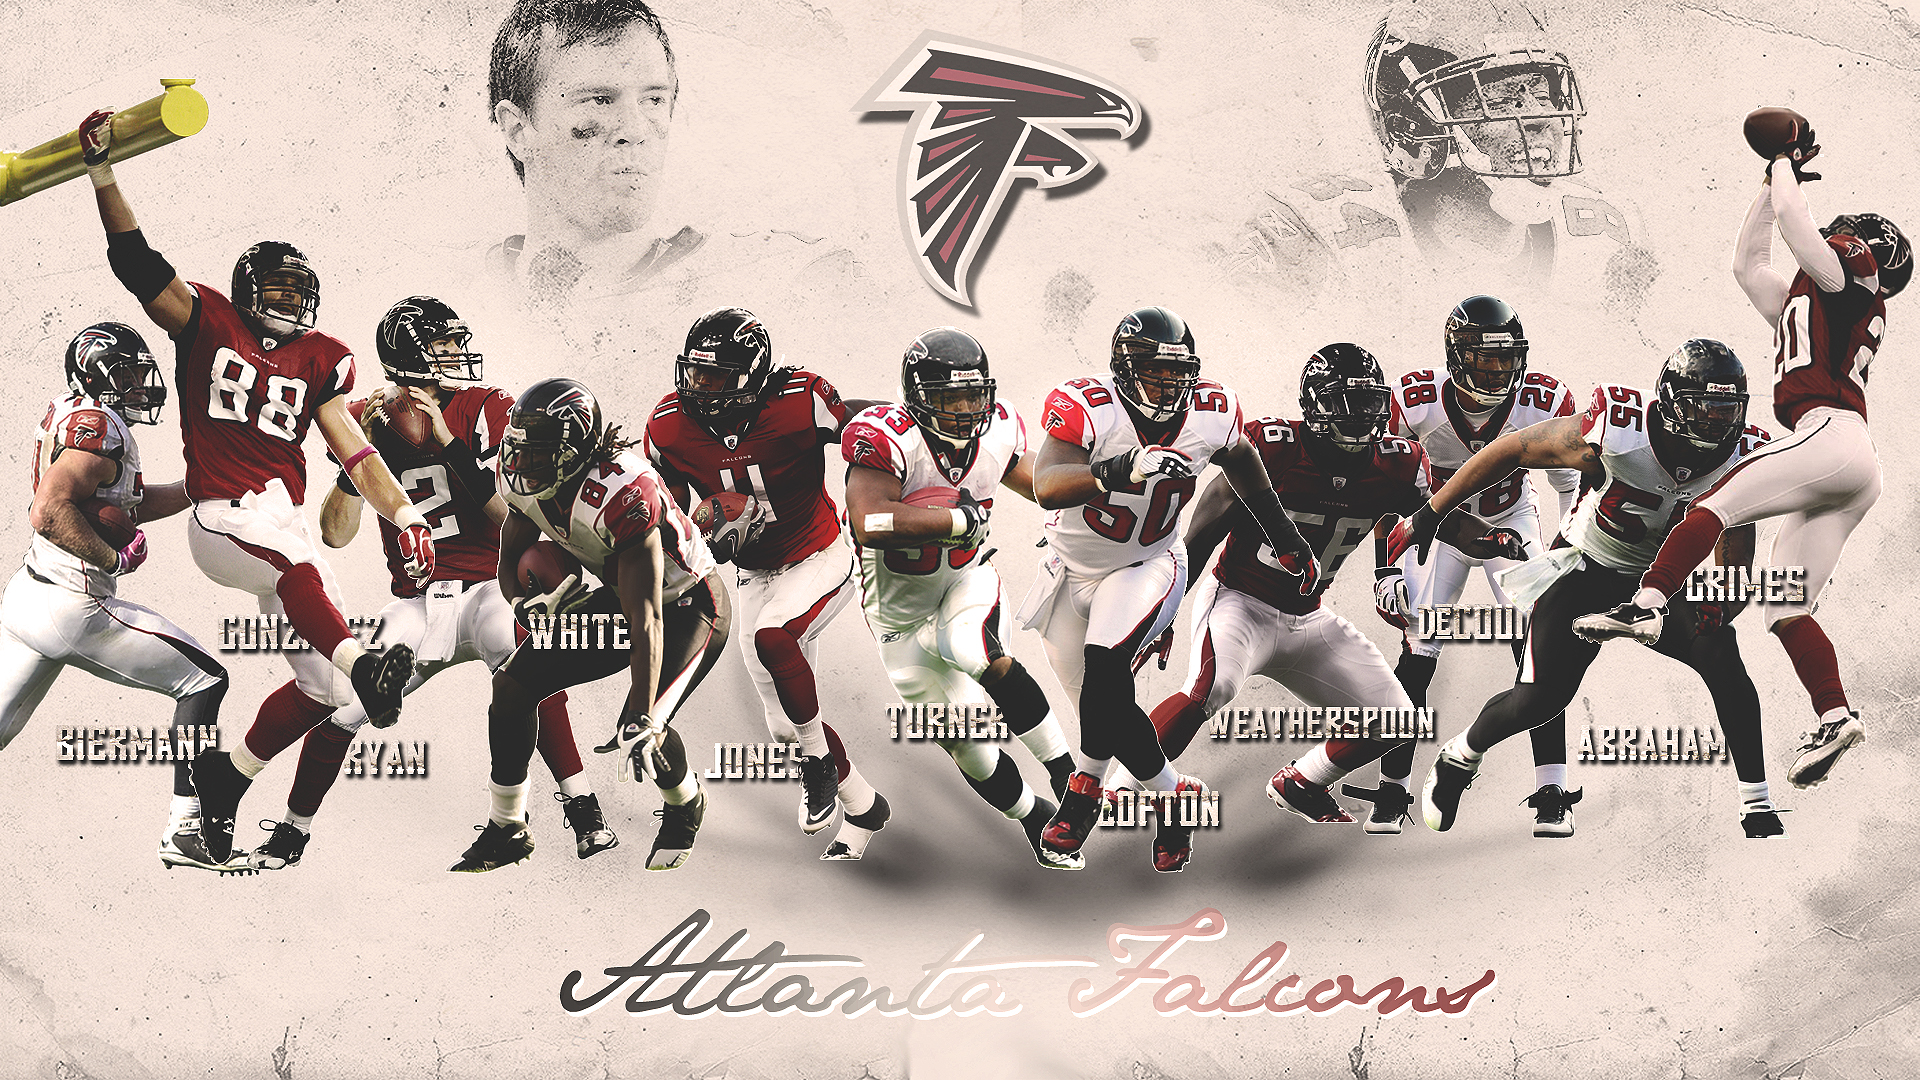 Atlanta Falcon Wallpaper Hd